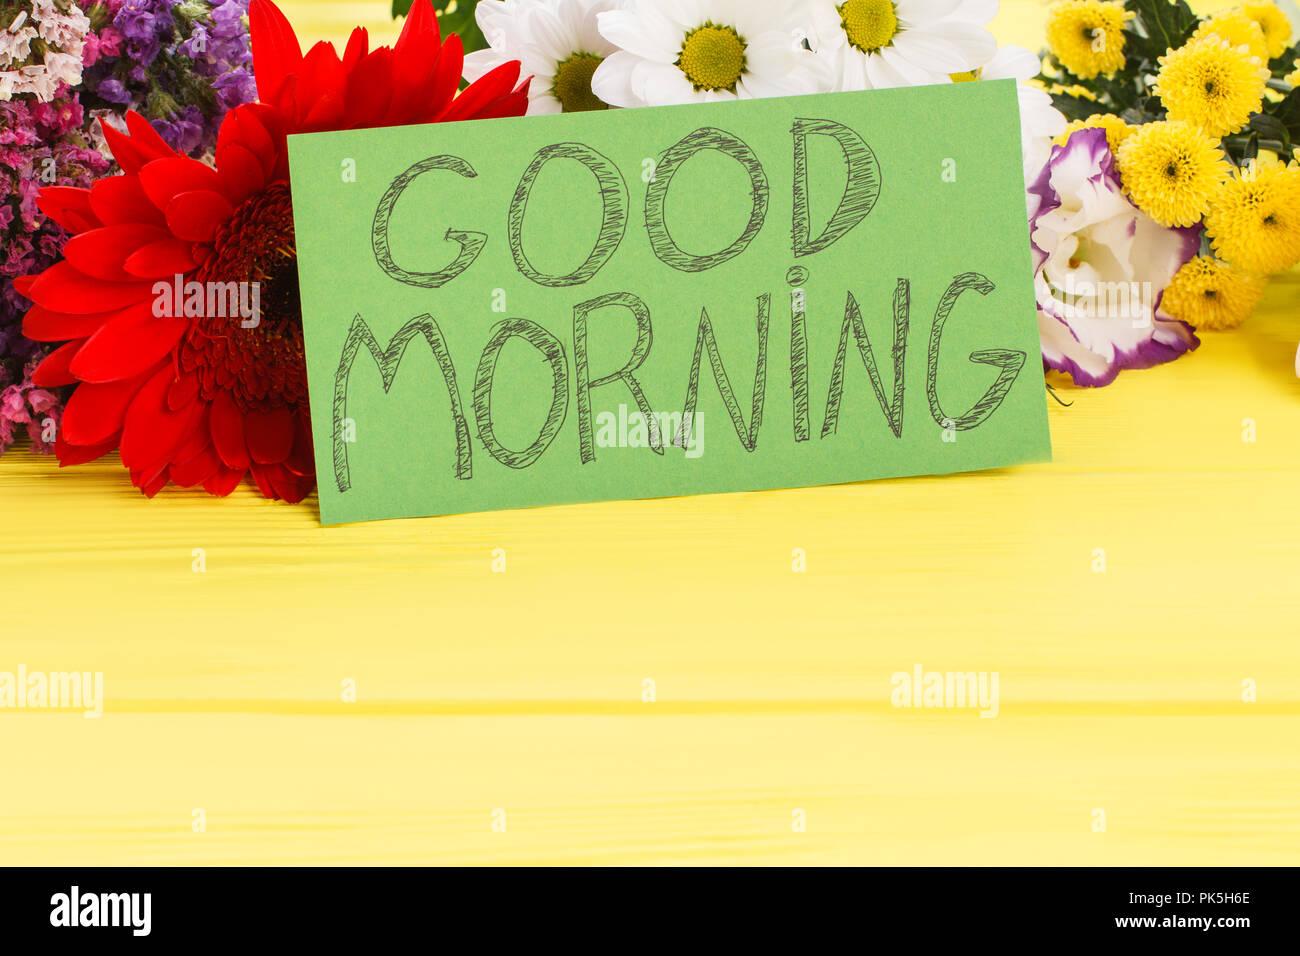 Good morning wish note and beautiful flowers close up yellow good morning wish note and beautiful flowers close up yellow wooden desk background izmirmasajfo